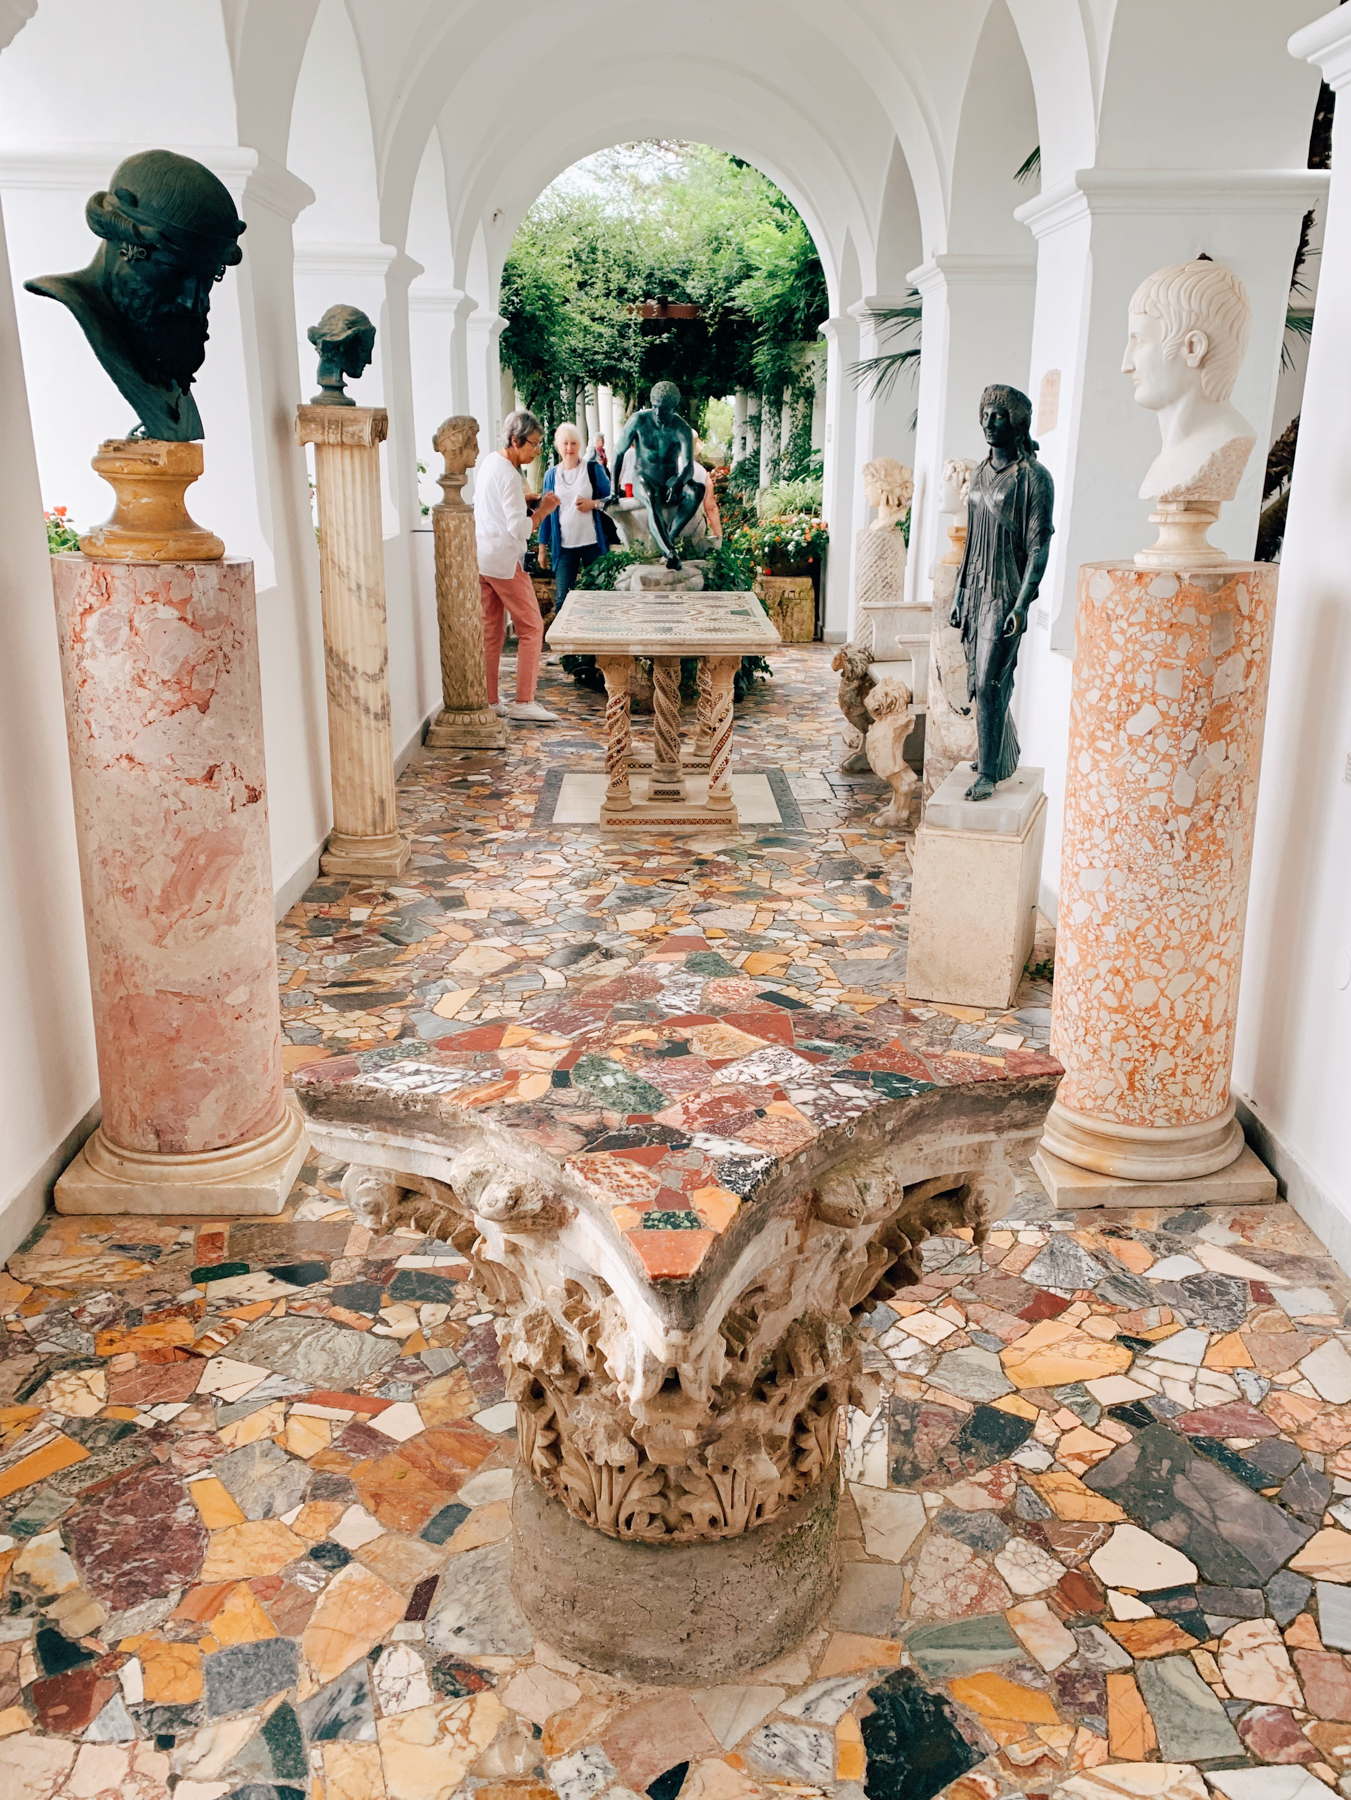 The entrance to Villa San Michele.